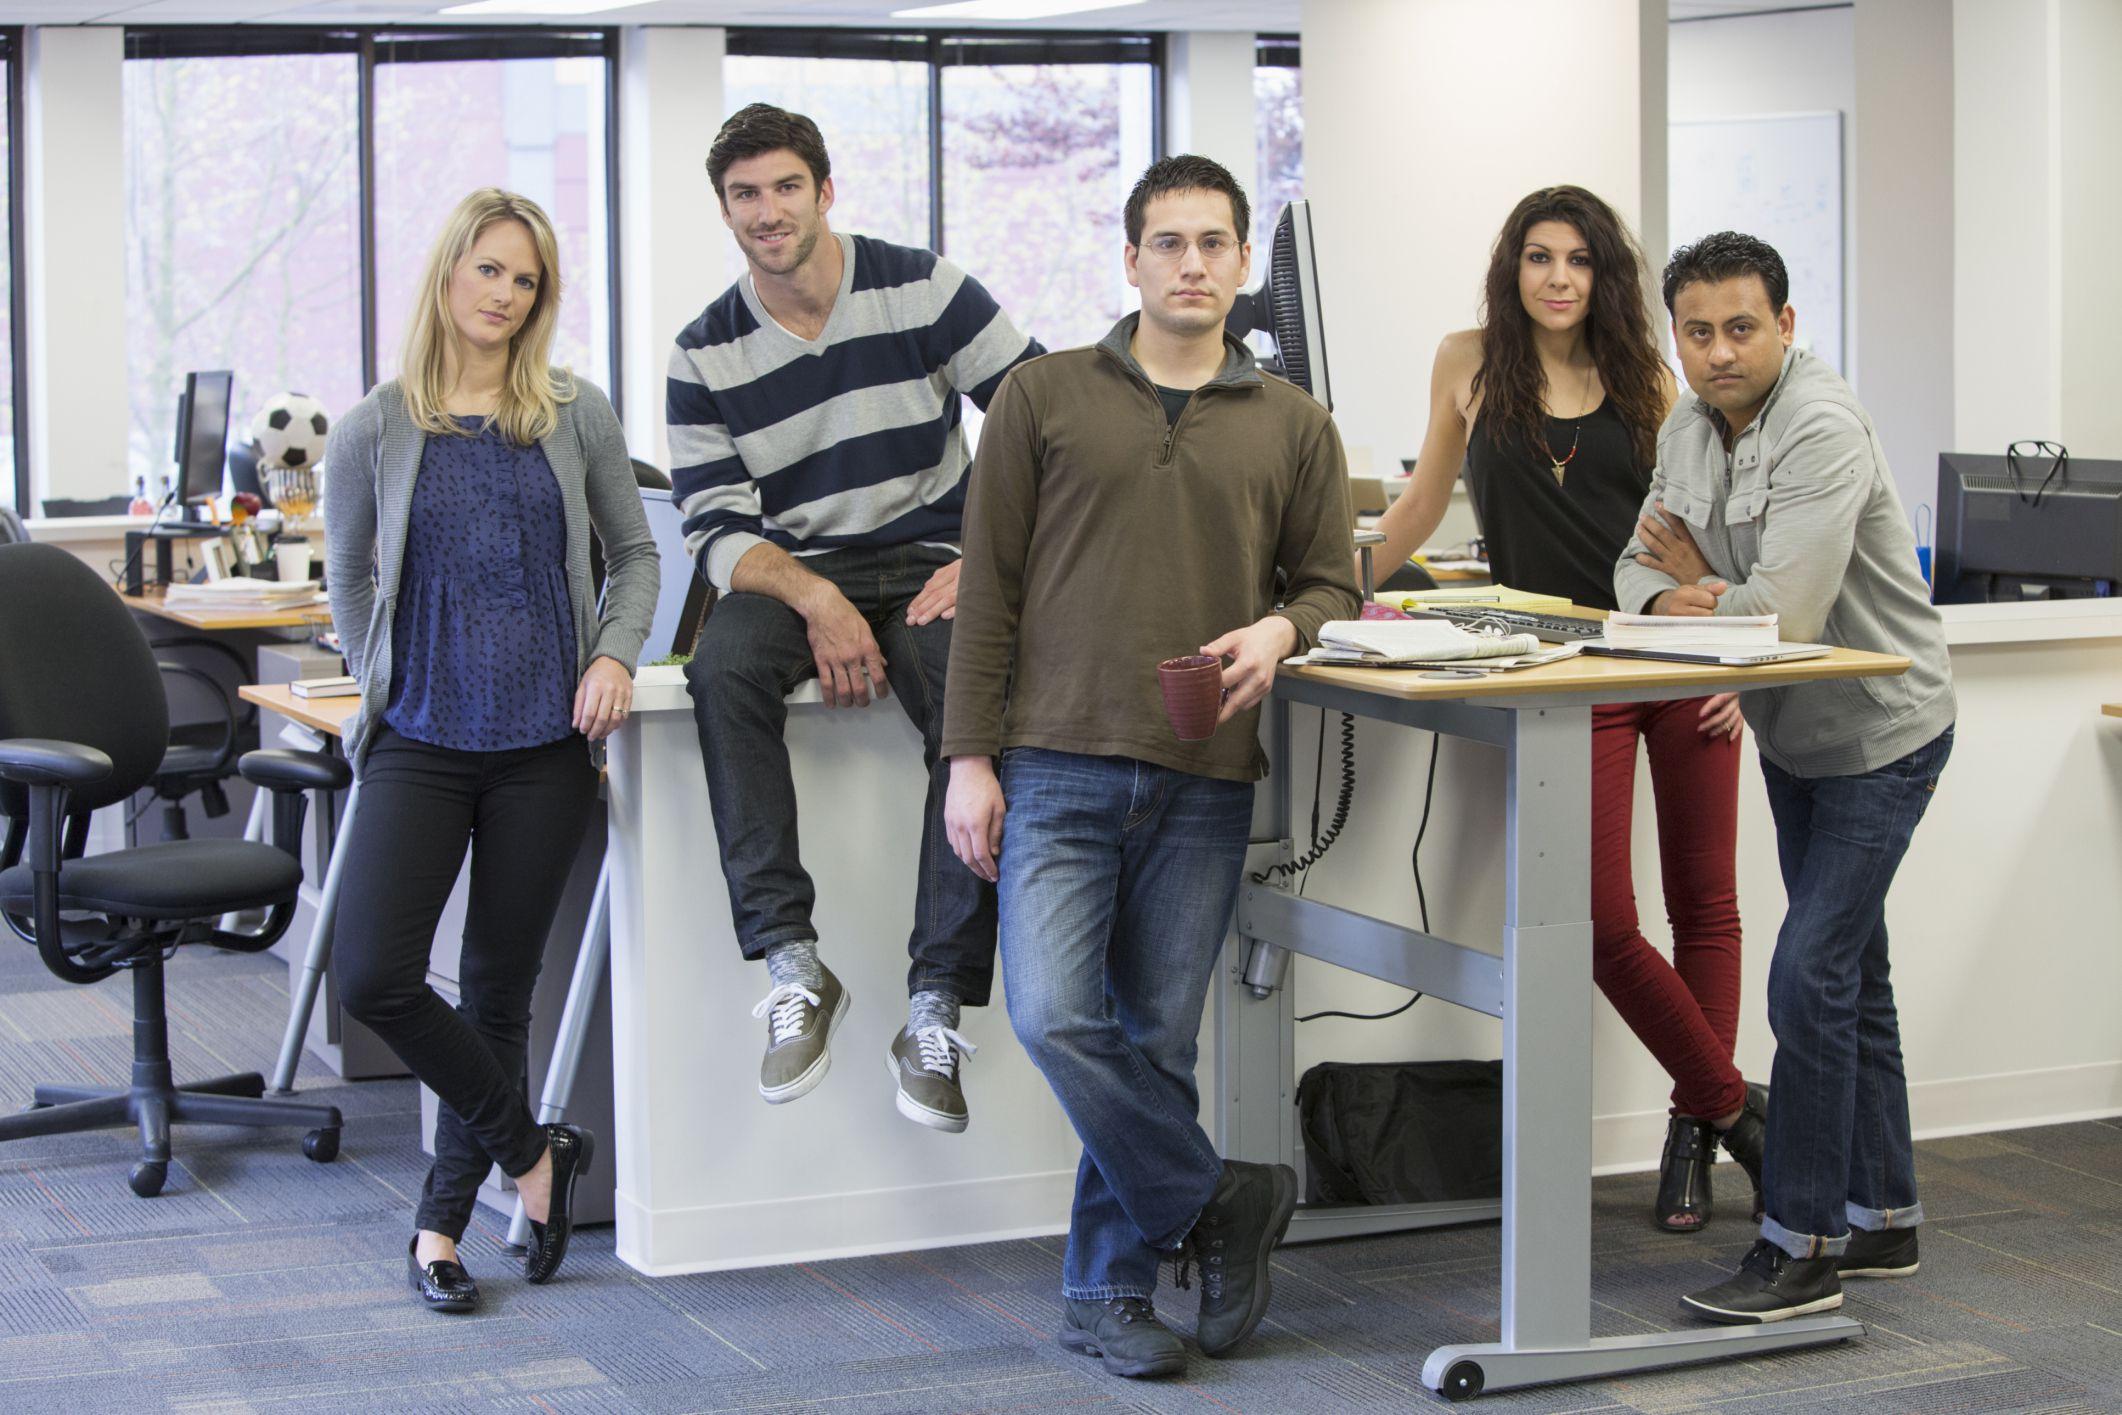 generation y lazy in workplace